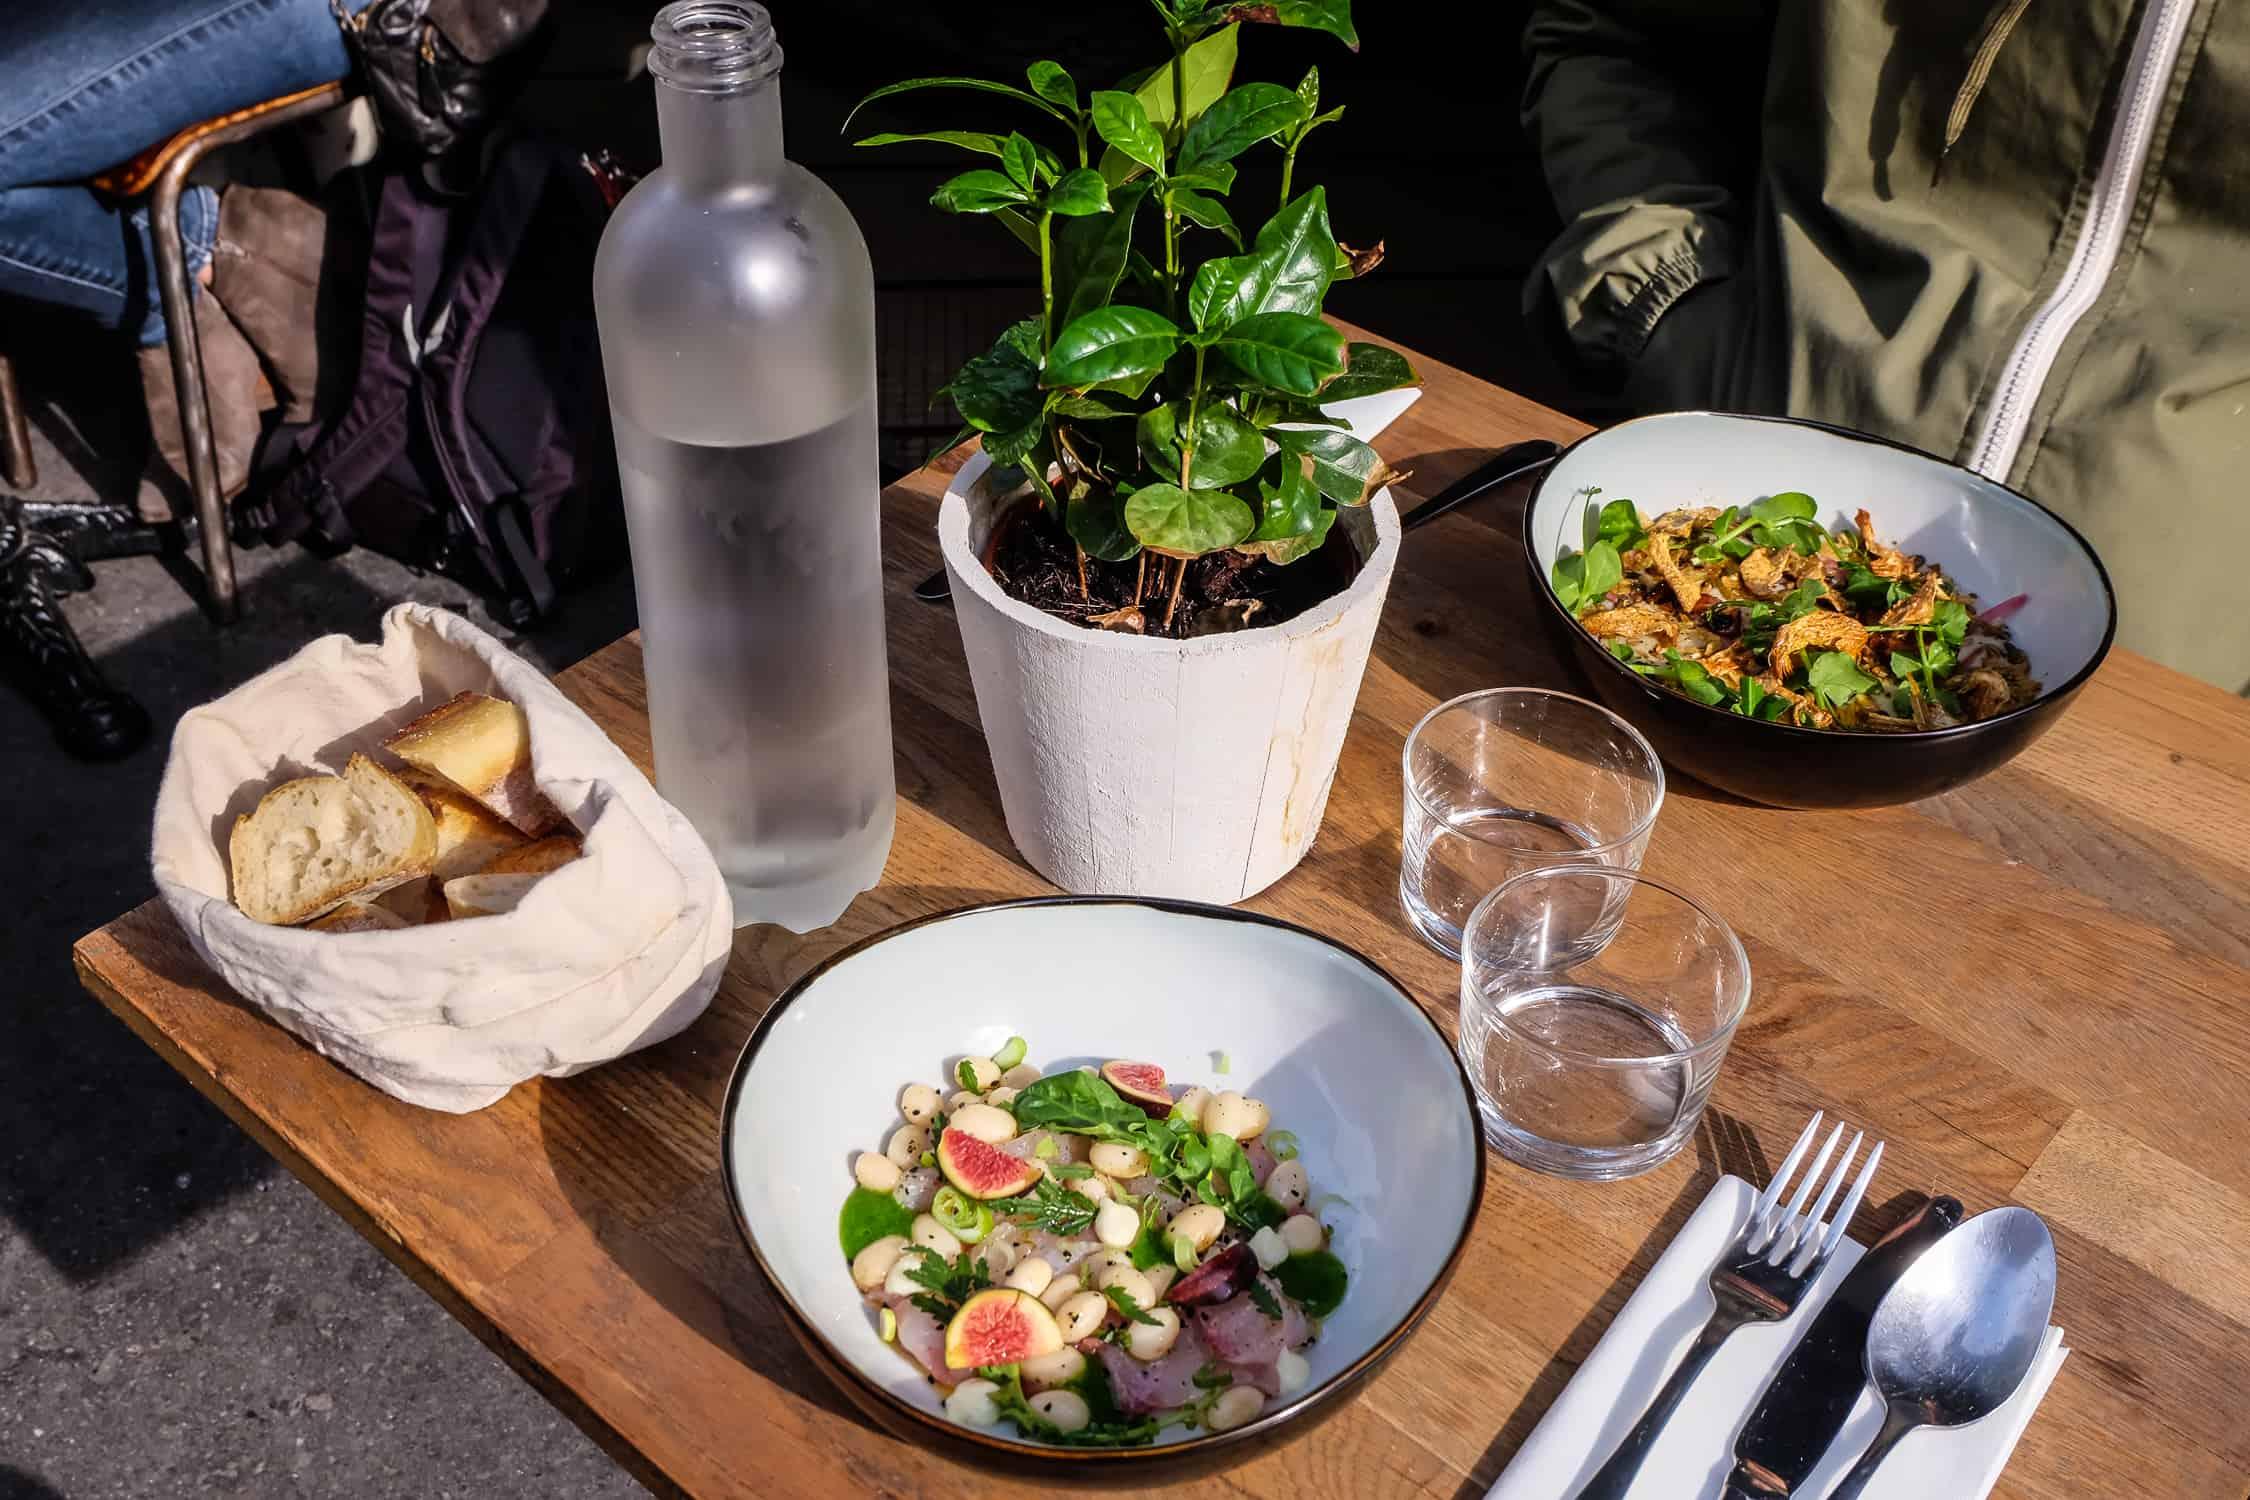 La-traversee-restaurant-paris-18-rue-ramey-7